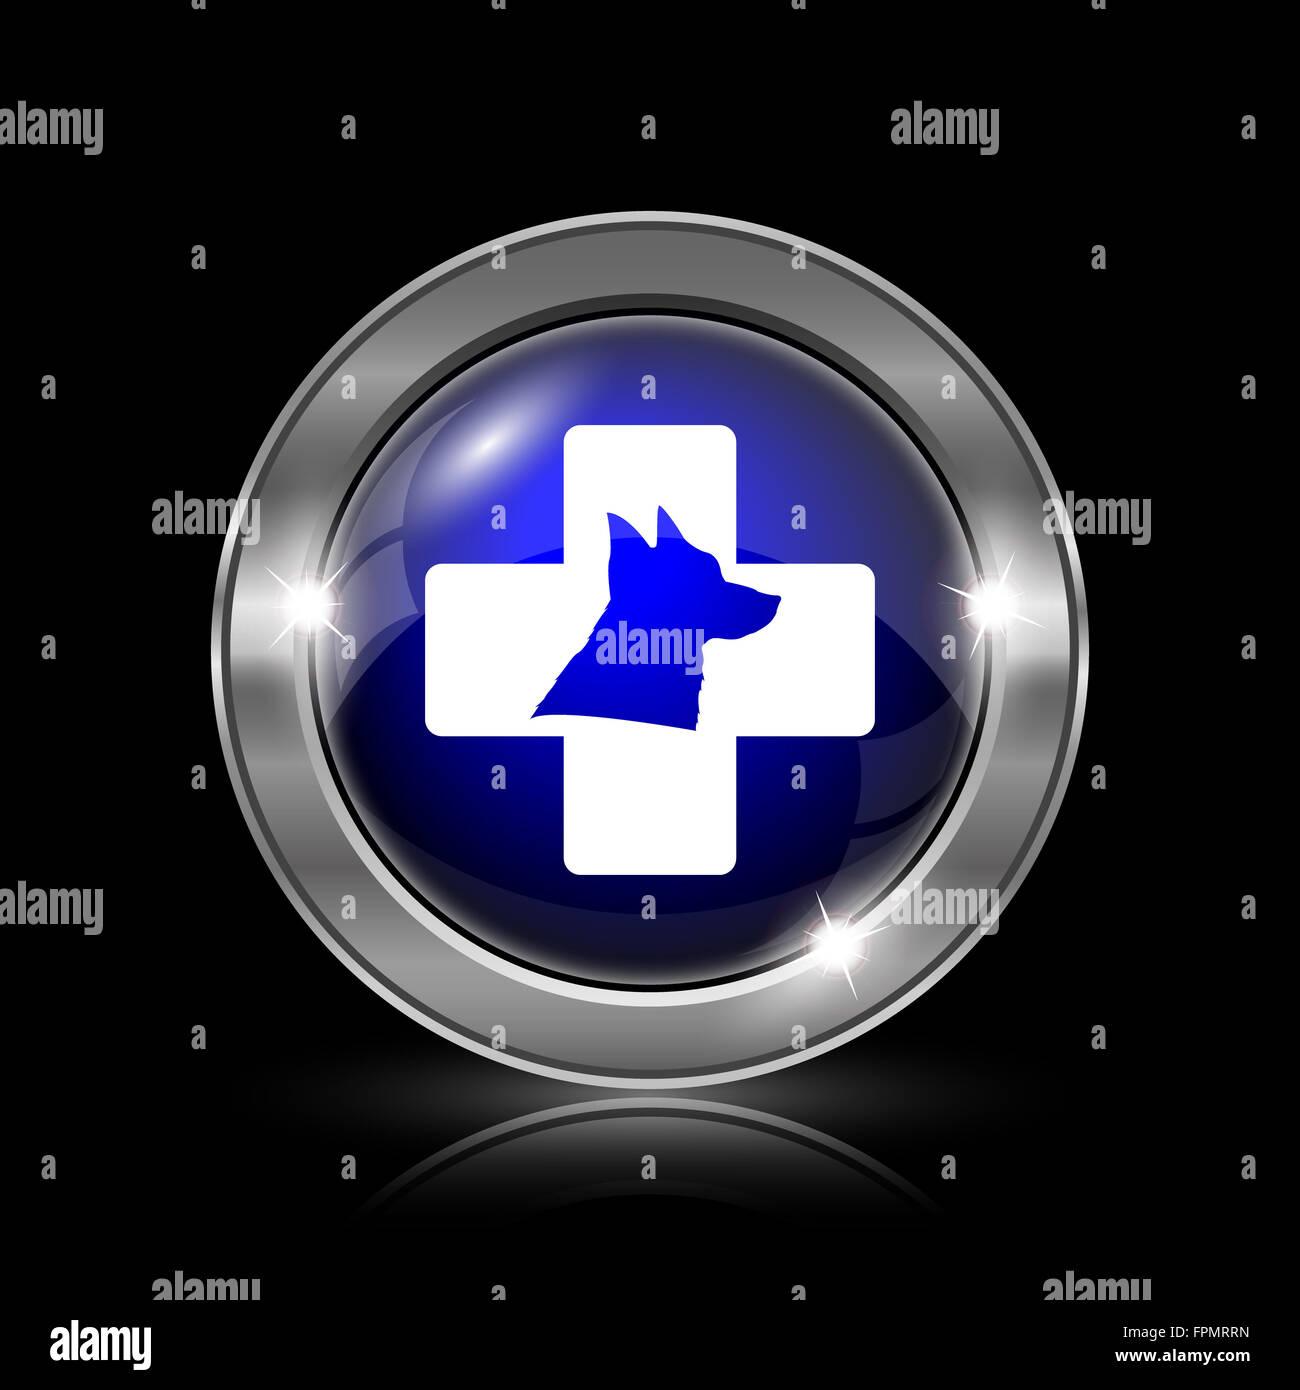 Veterinary icon. Metallic internet button on black background. - Stock Image